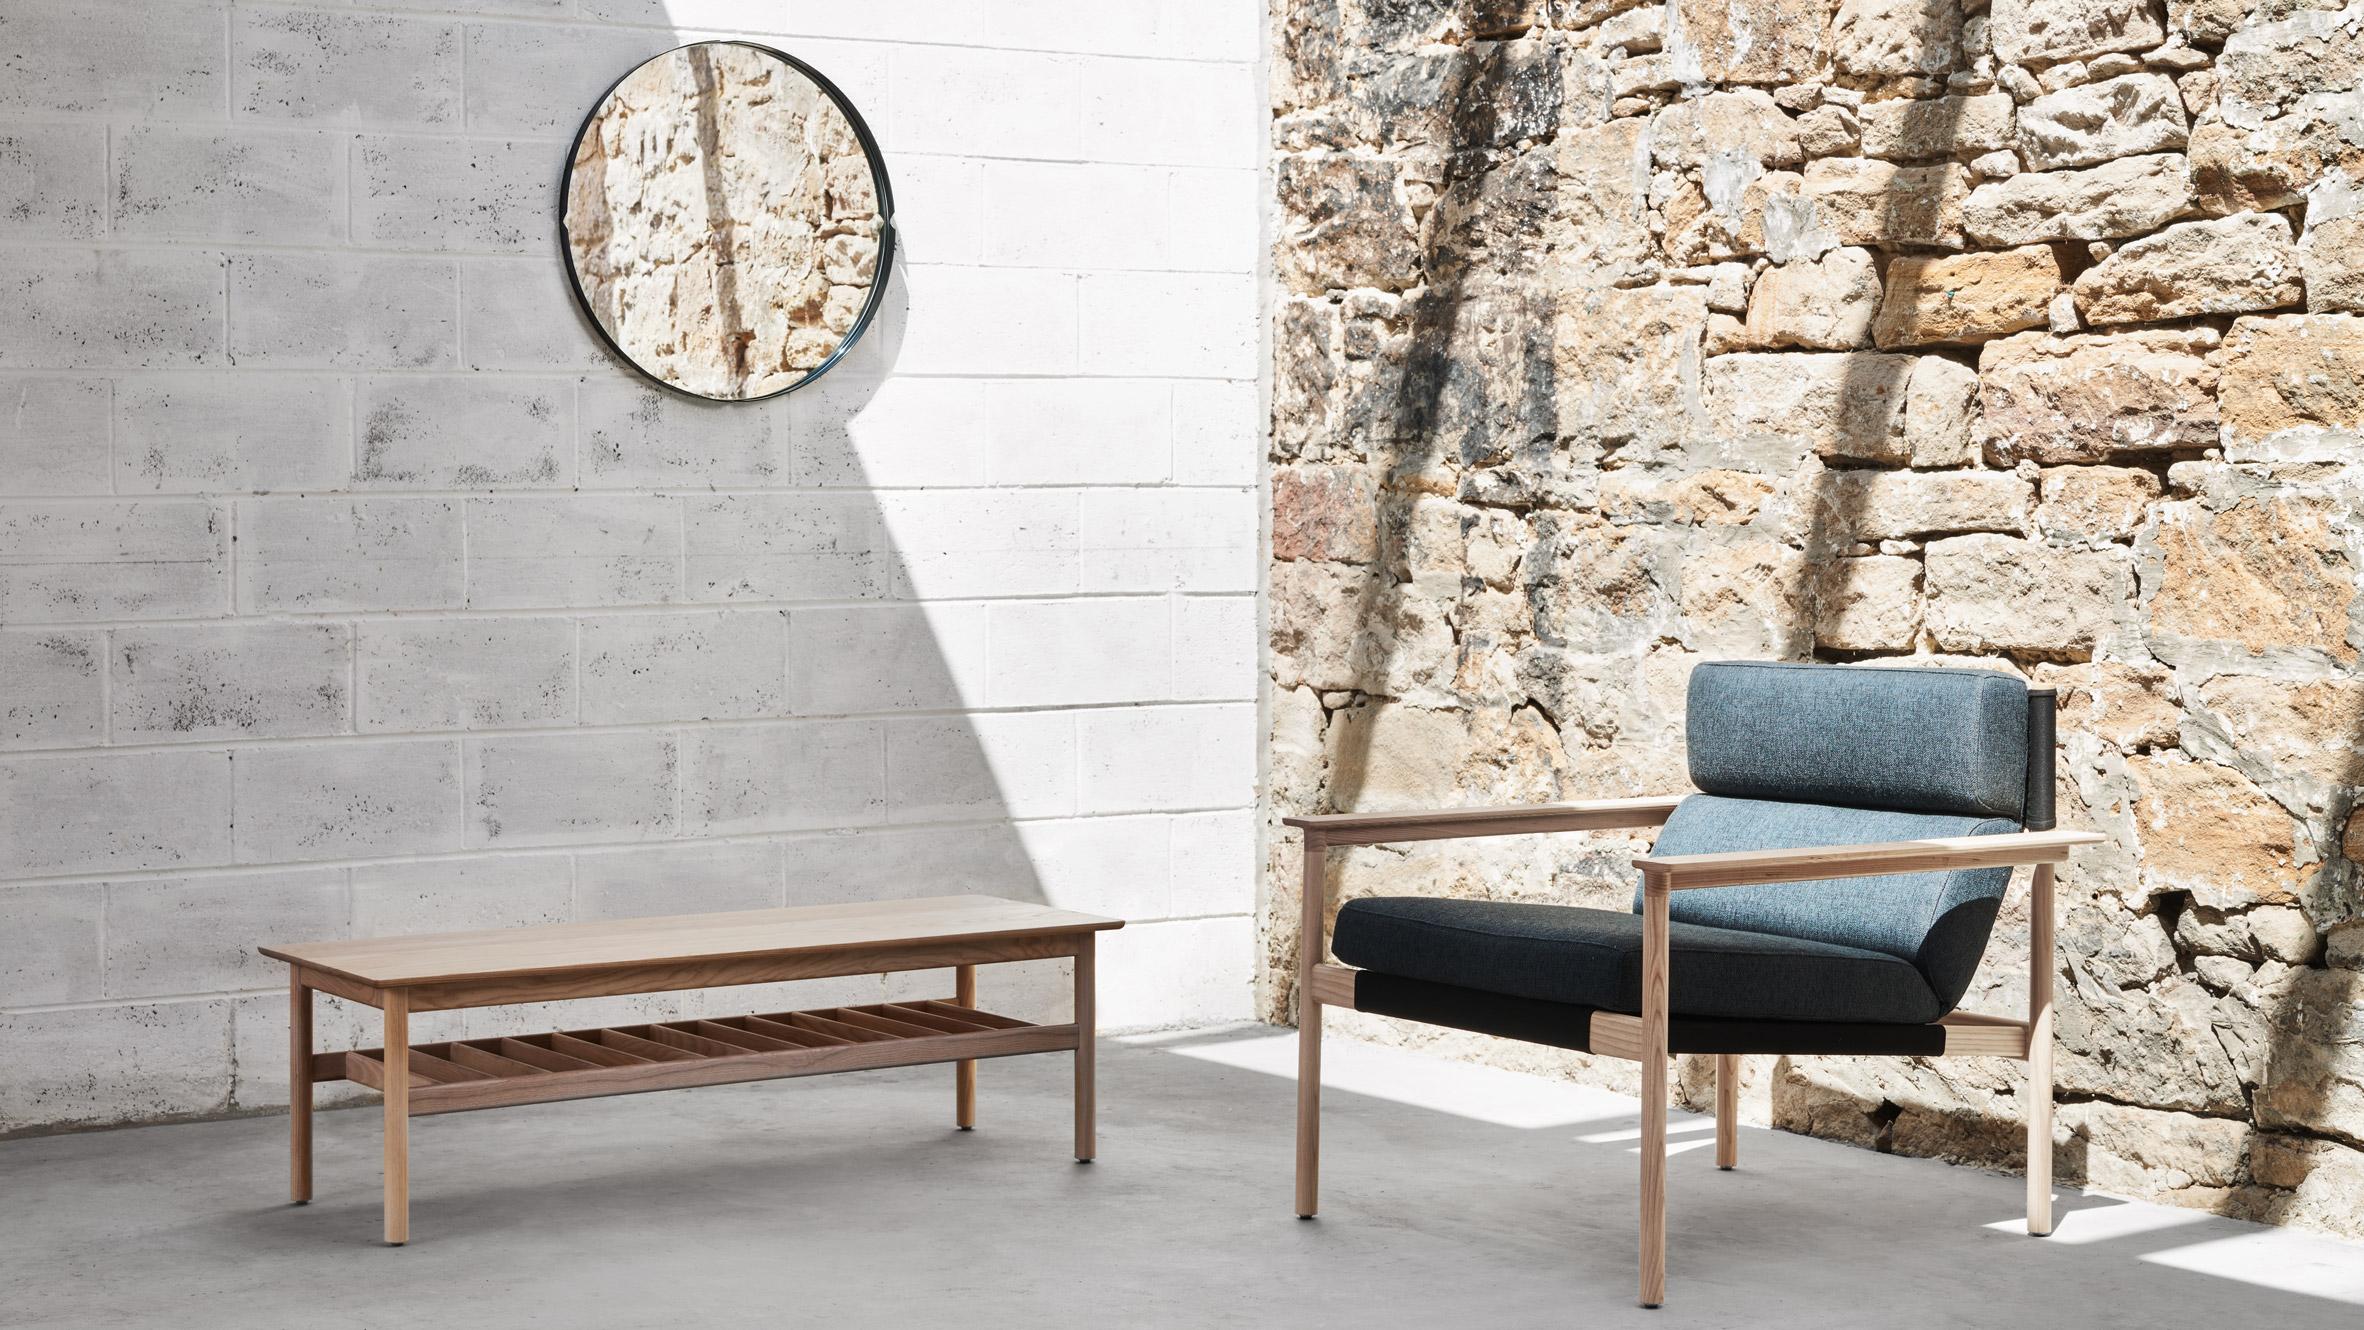 NAU - New Australian Design